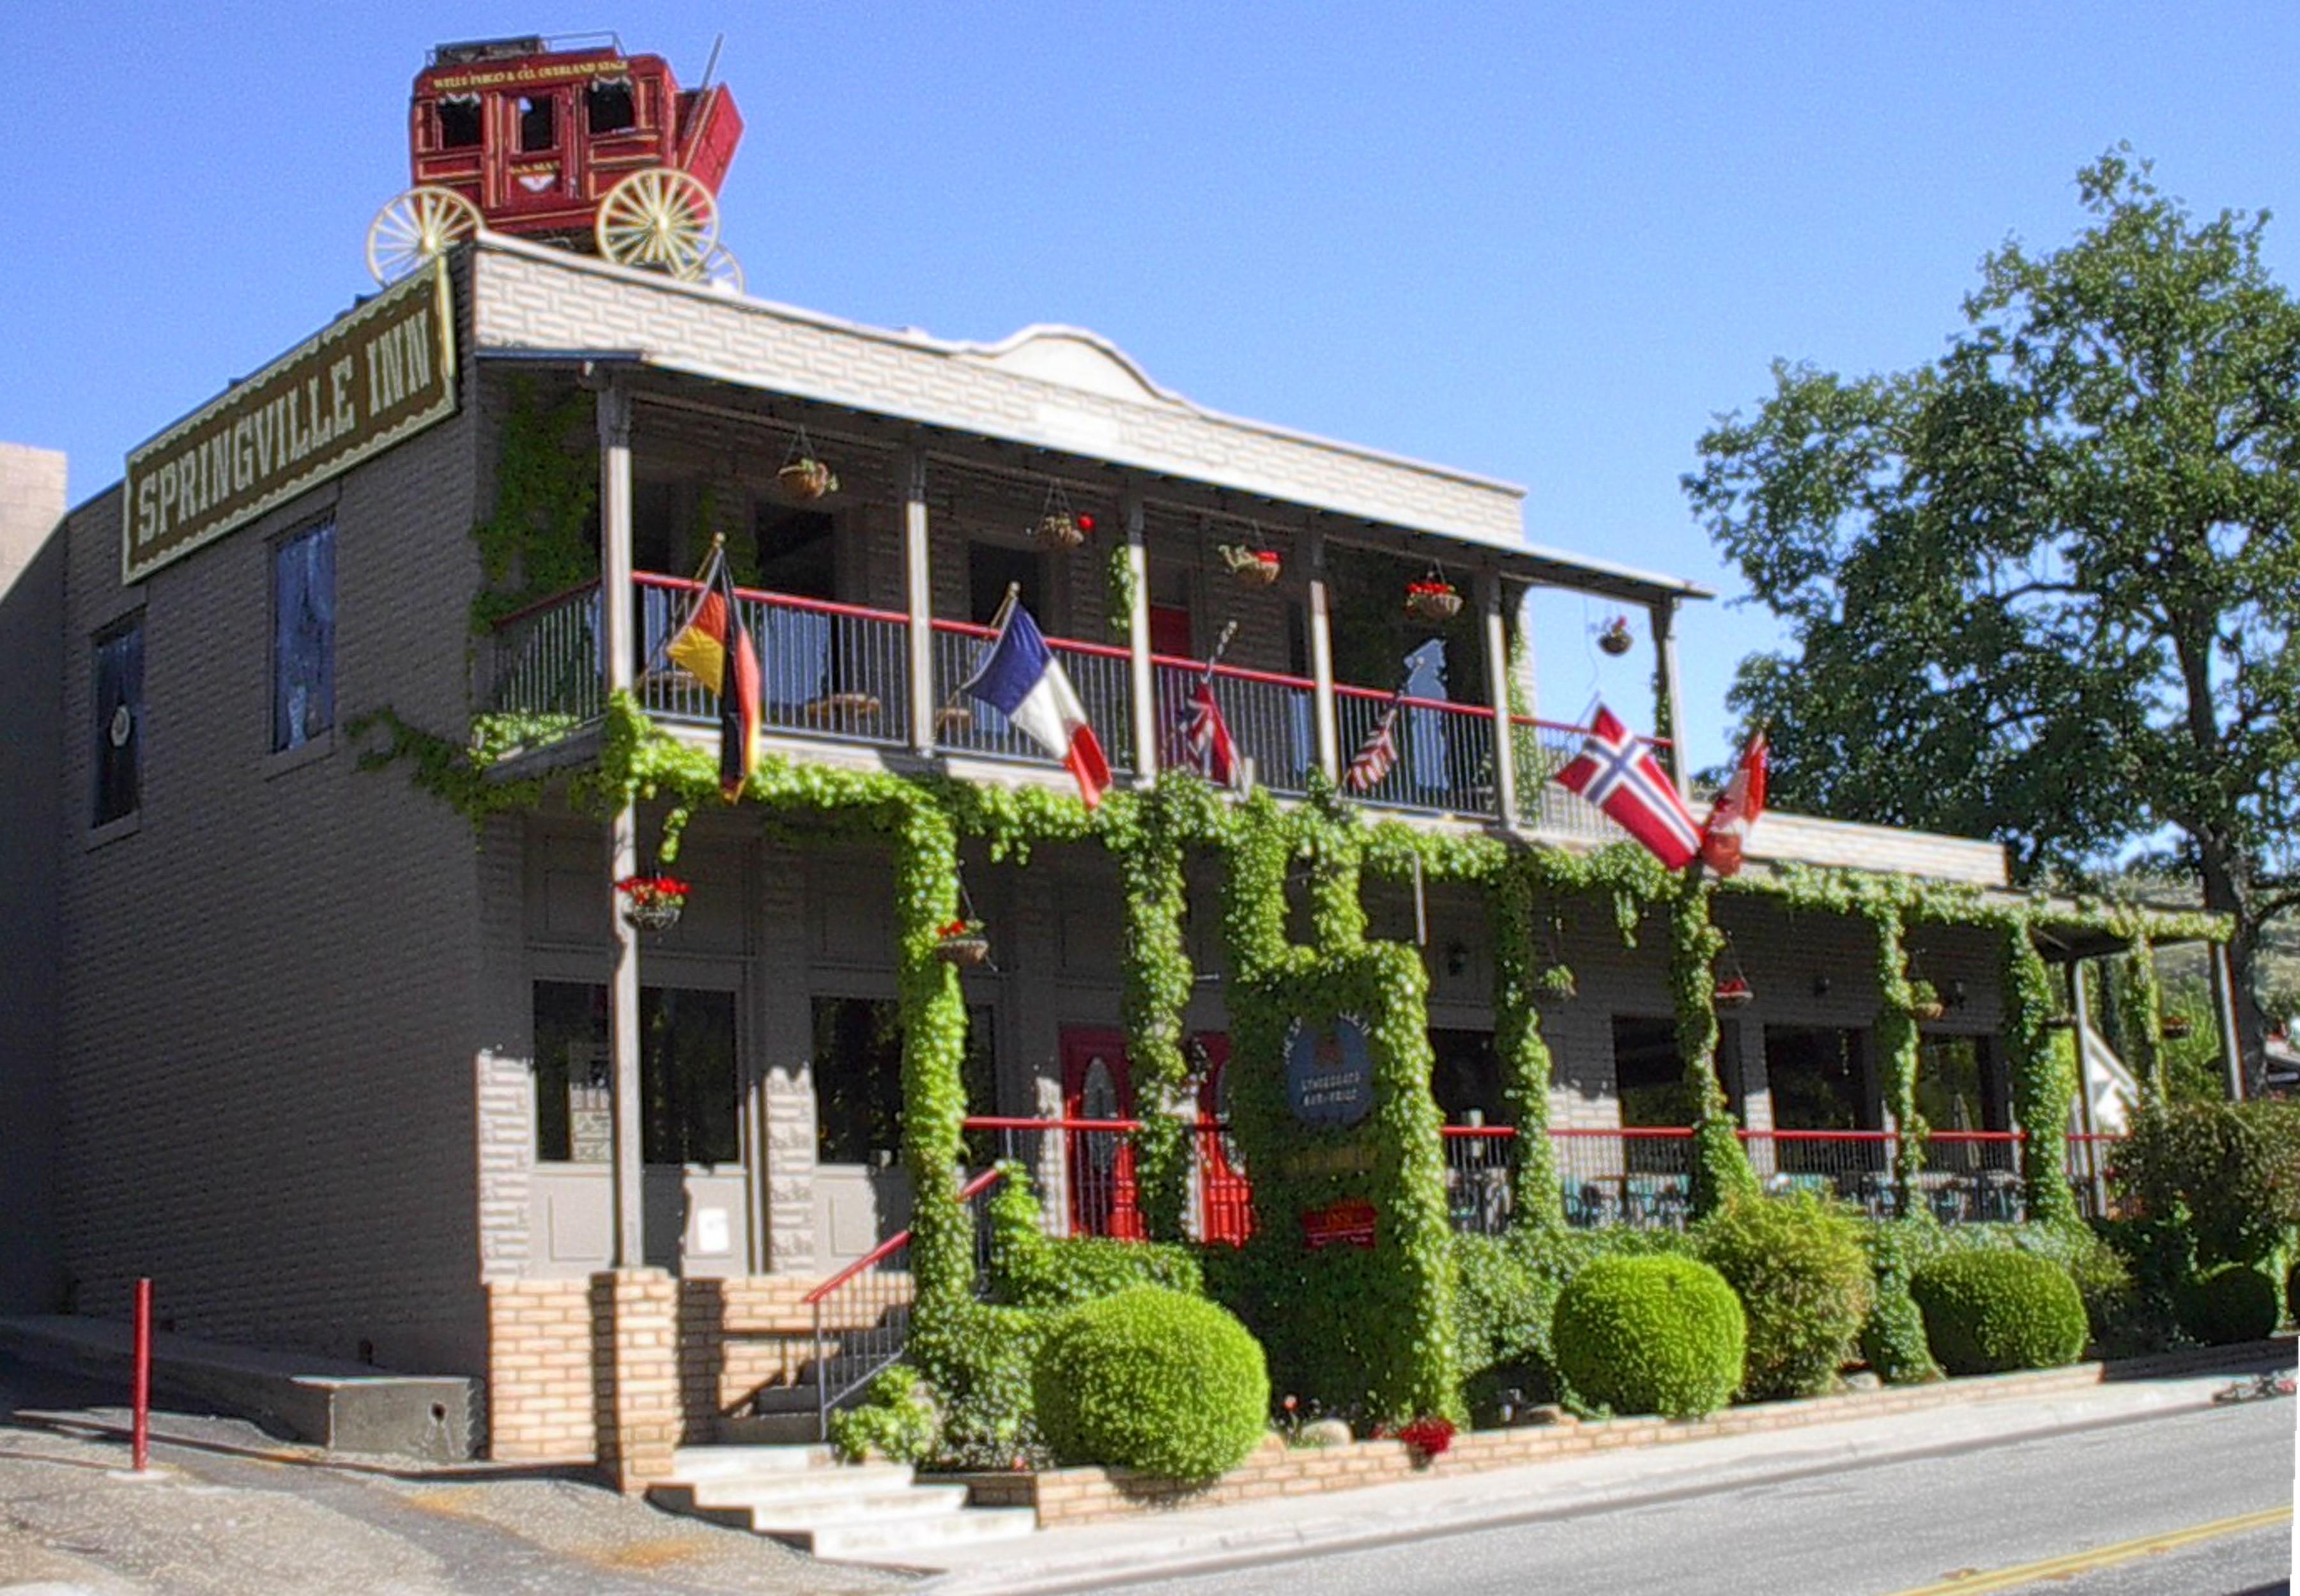 Springville Rentals